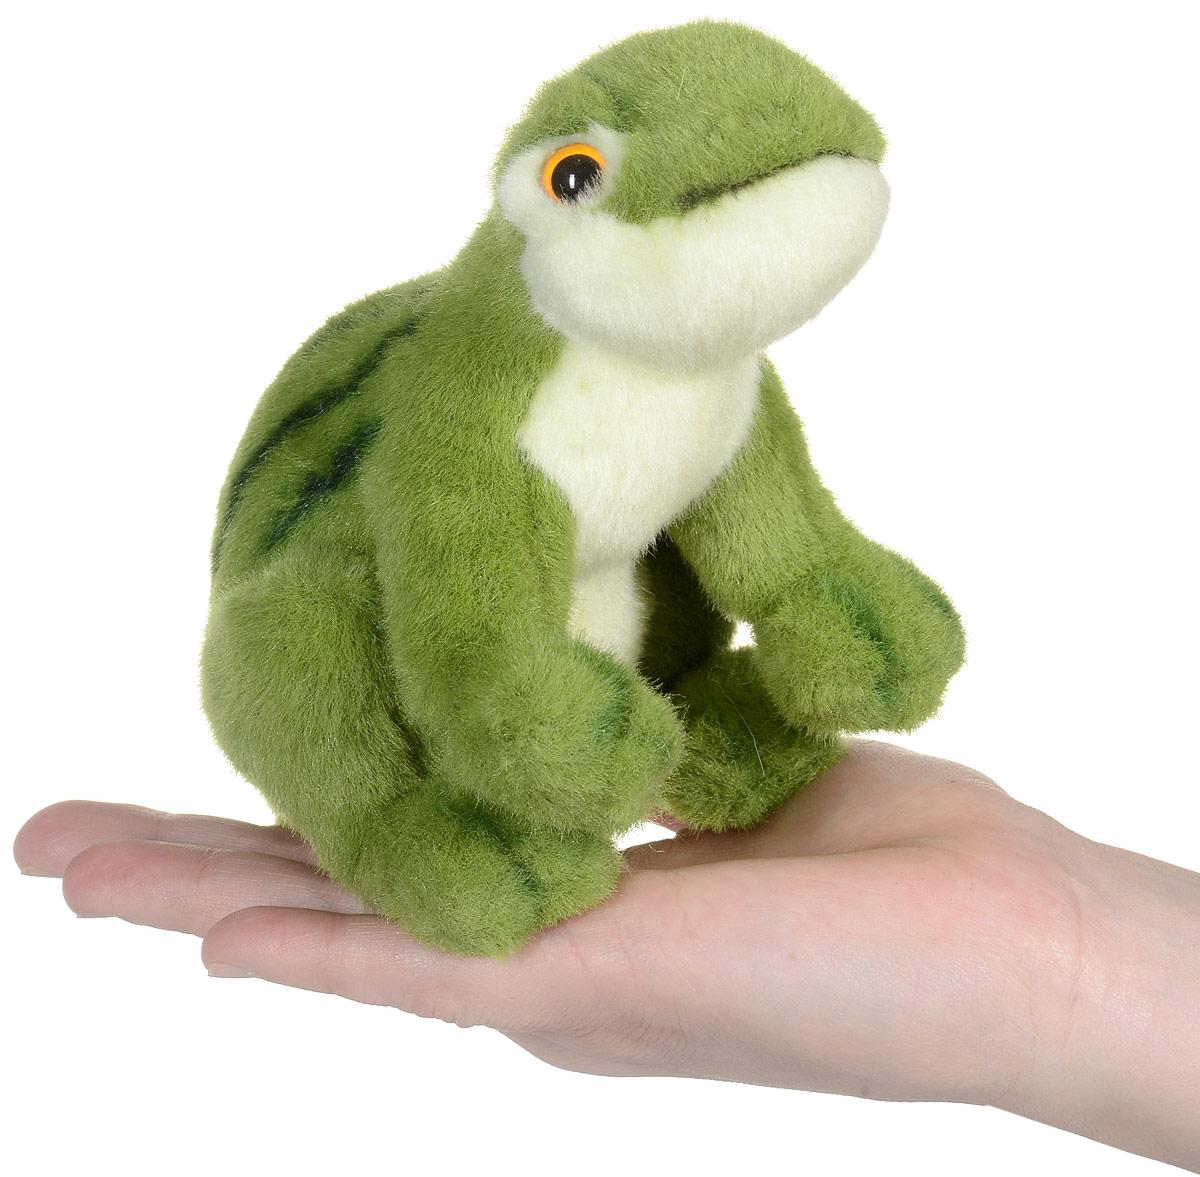 Hansa Toys Мягкая игрушка Зеленая лягушка 16 см